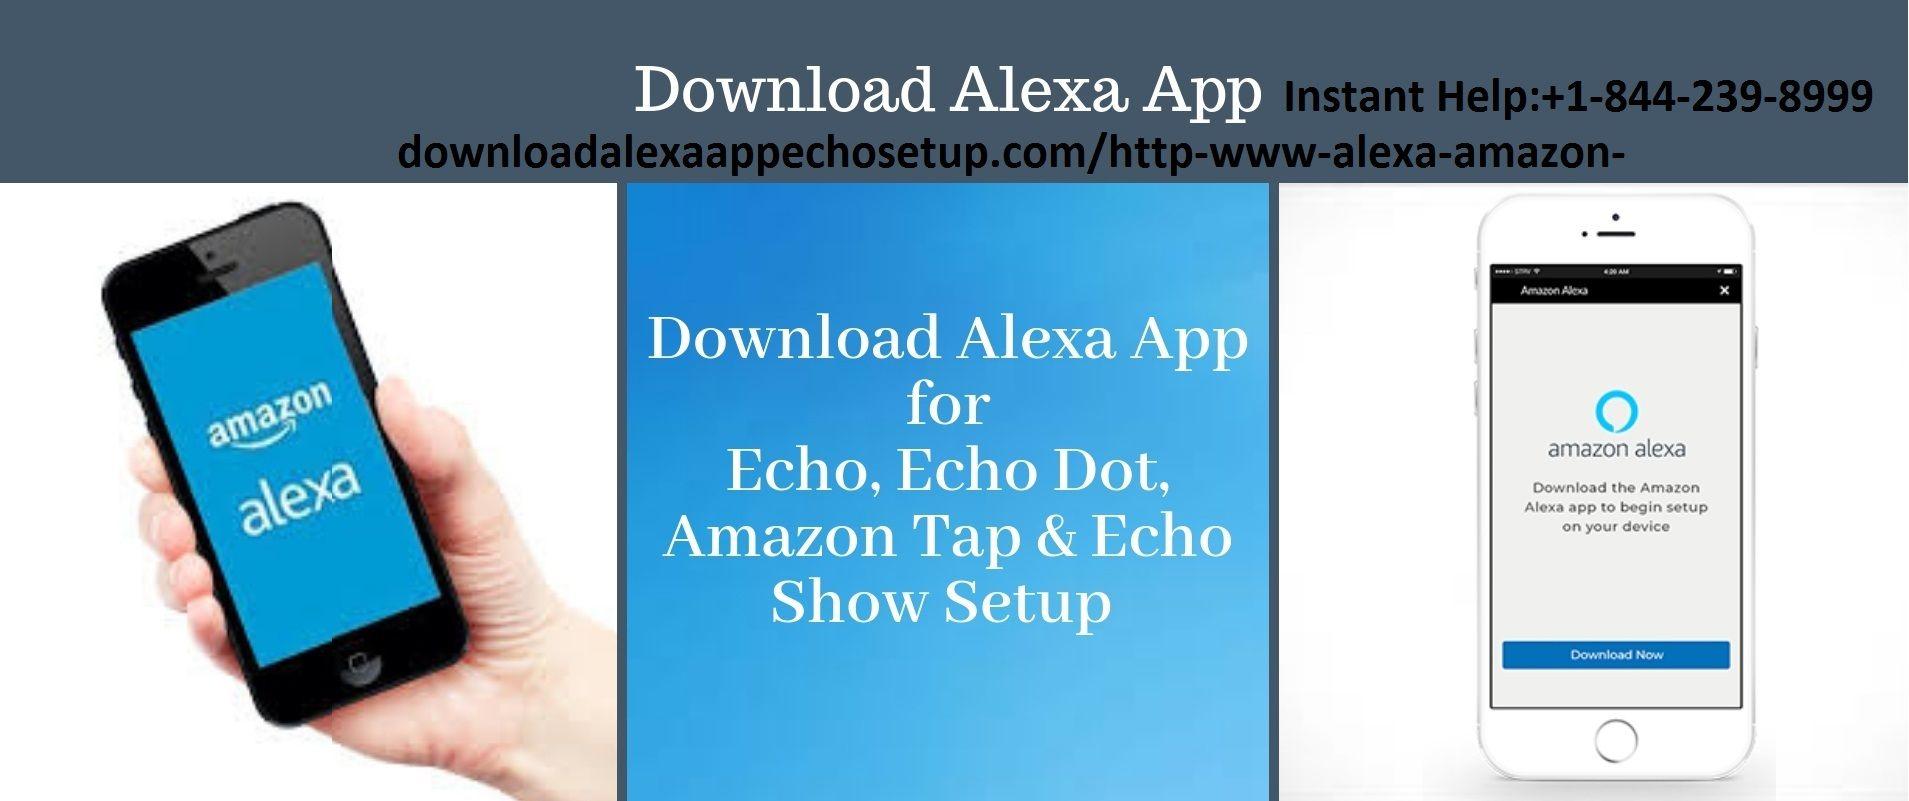 We are here to help you download alexa app, alexa app